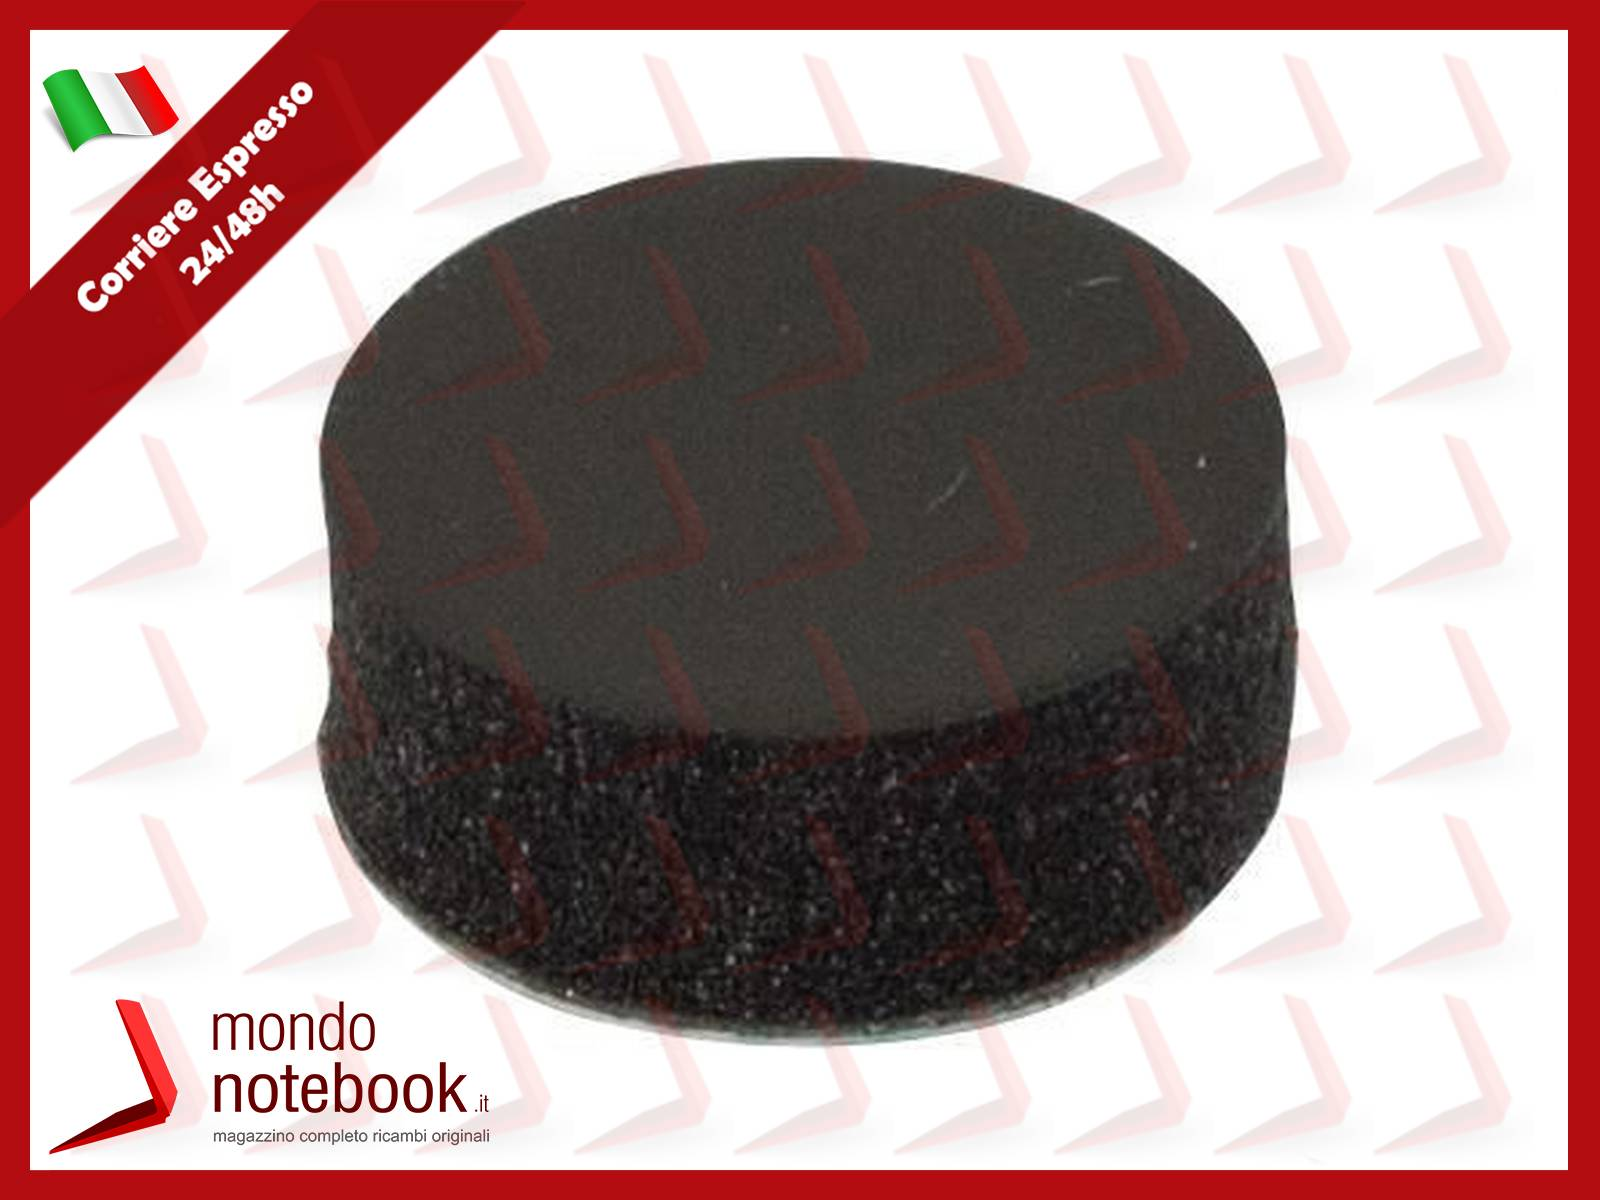 tastiera-notebook-dell-inspiron-17r-n7110-nera-retroilluminata-con-adesivi-layout-italiano